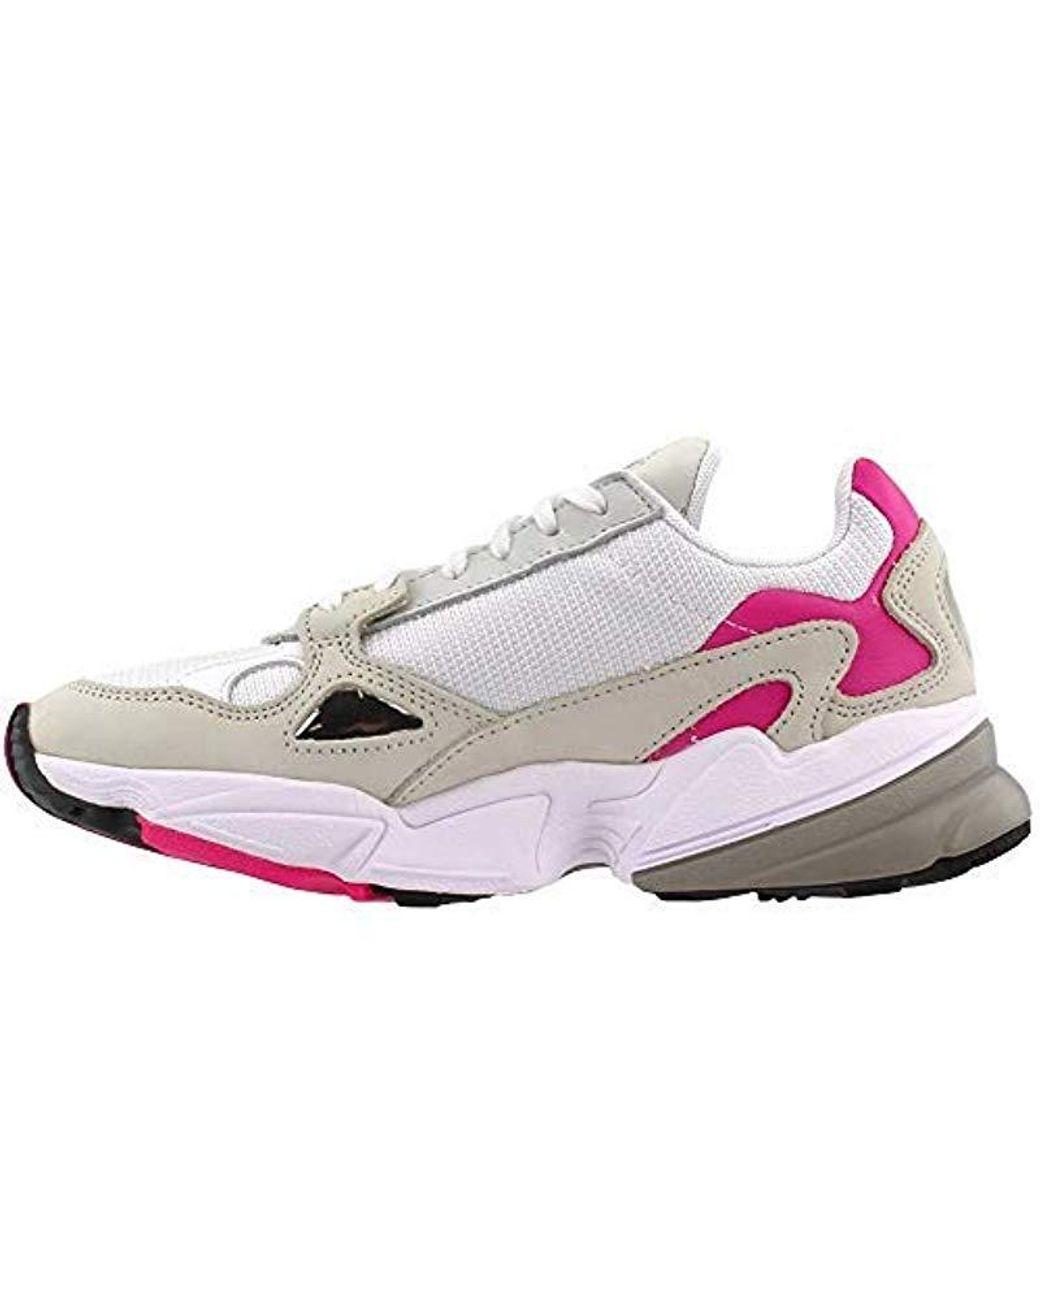 adidas Falcon W Womens Cm8537 Size 9